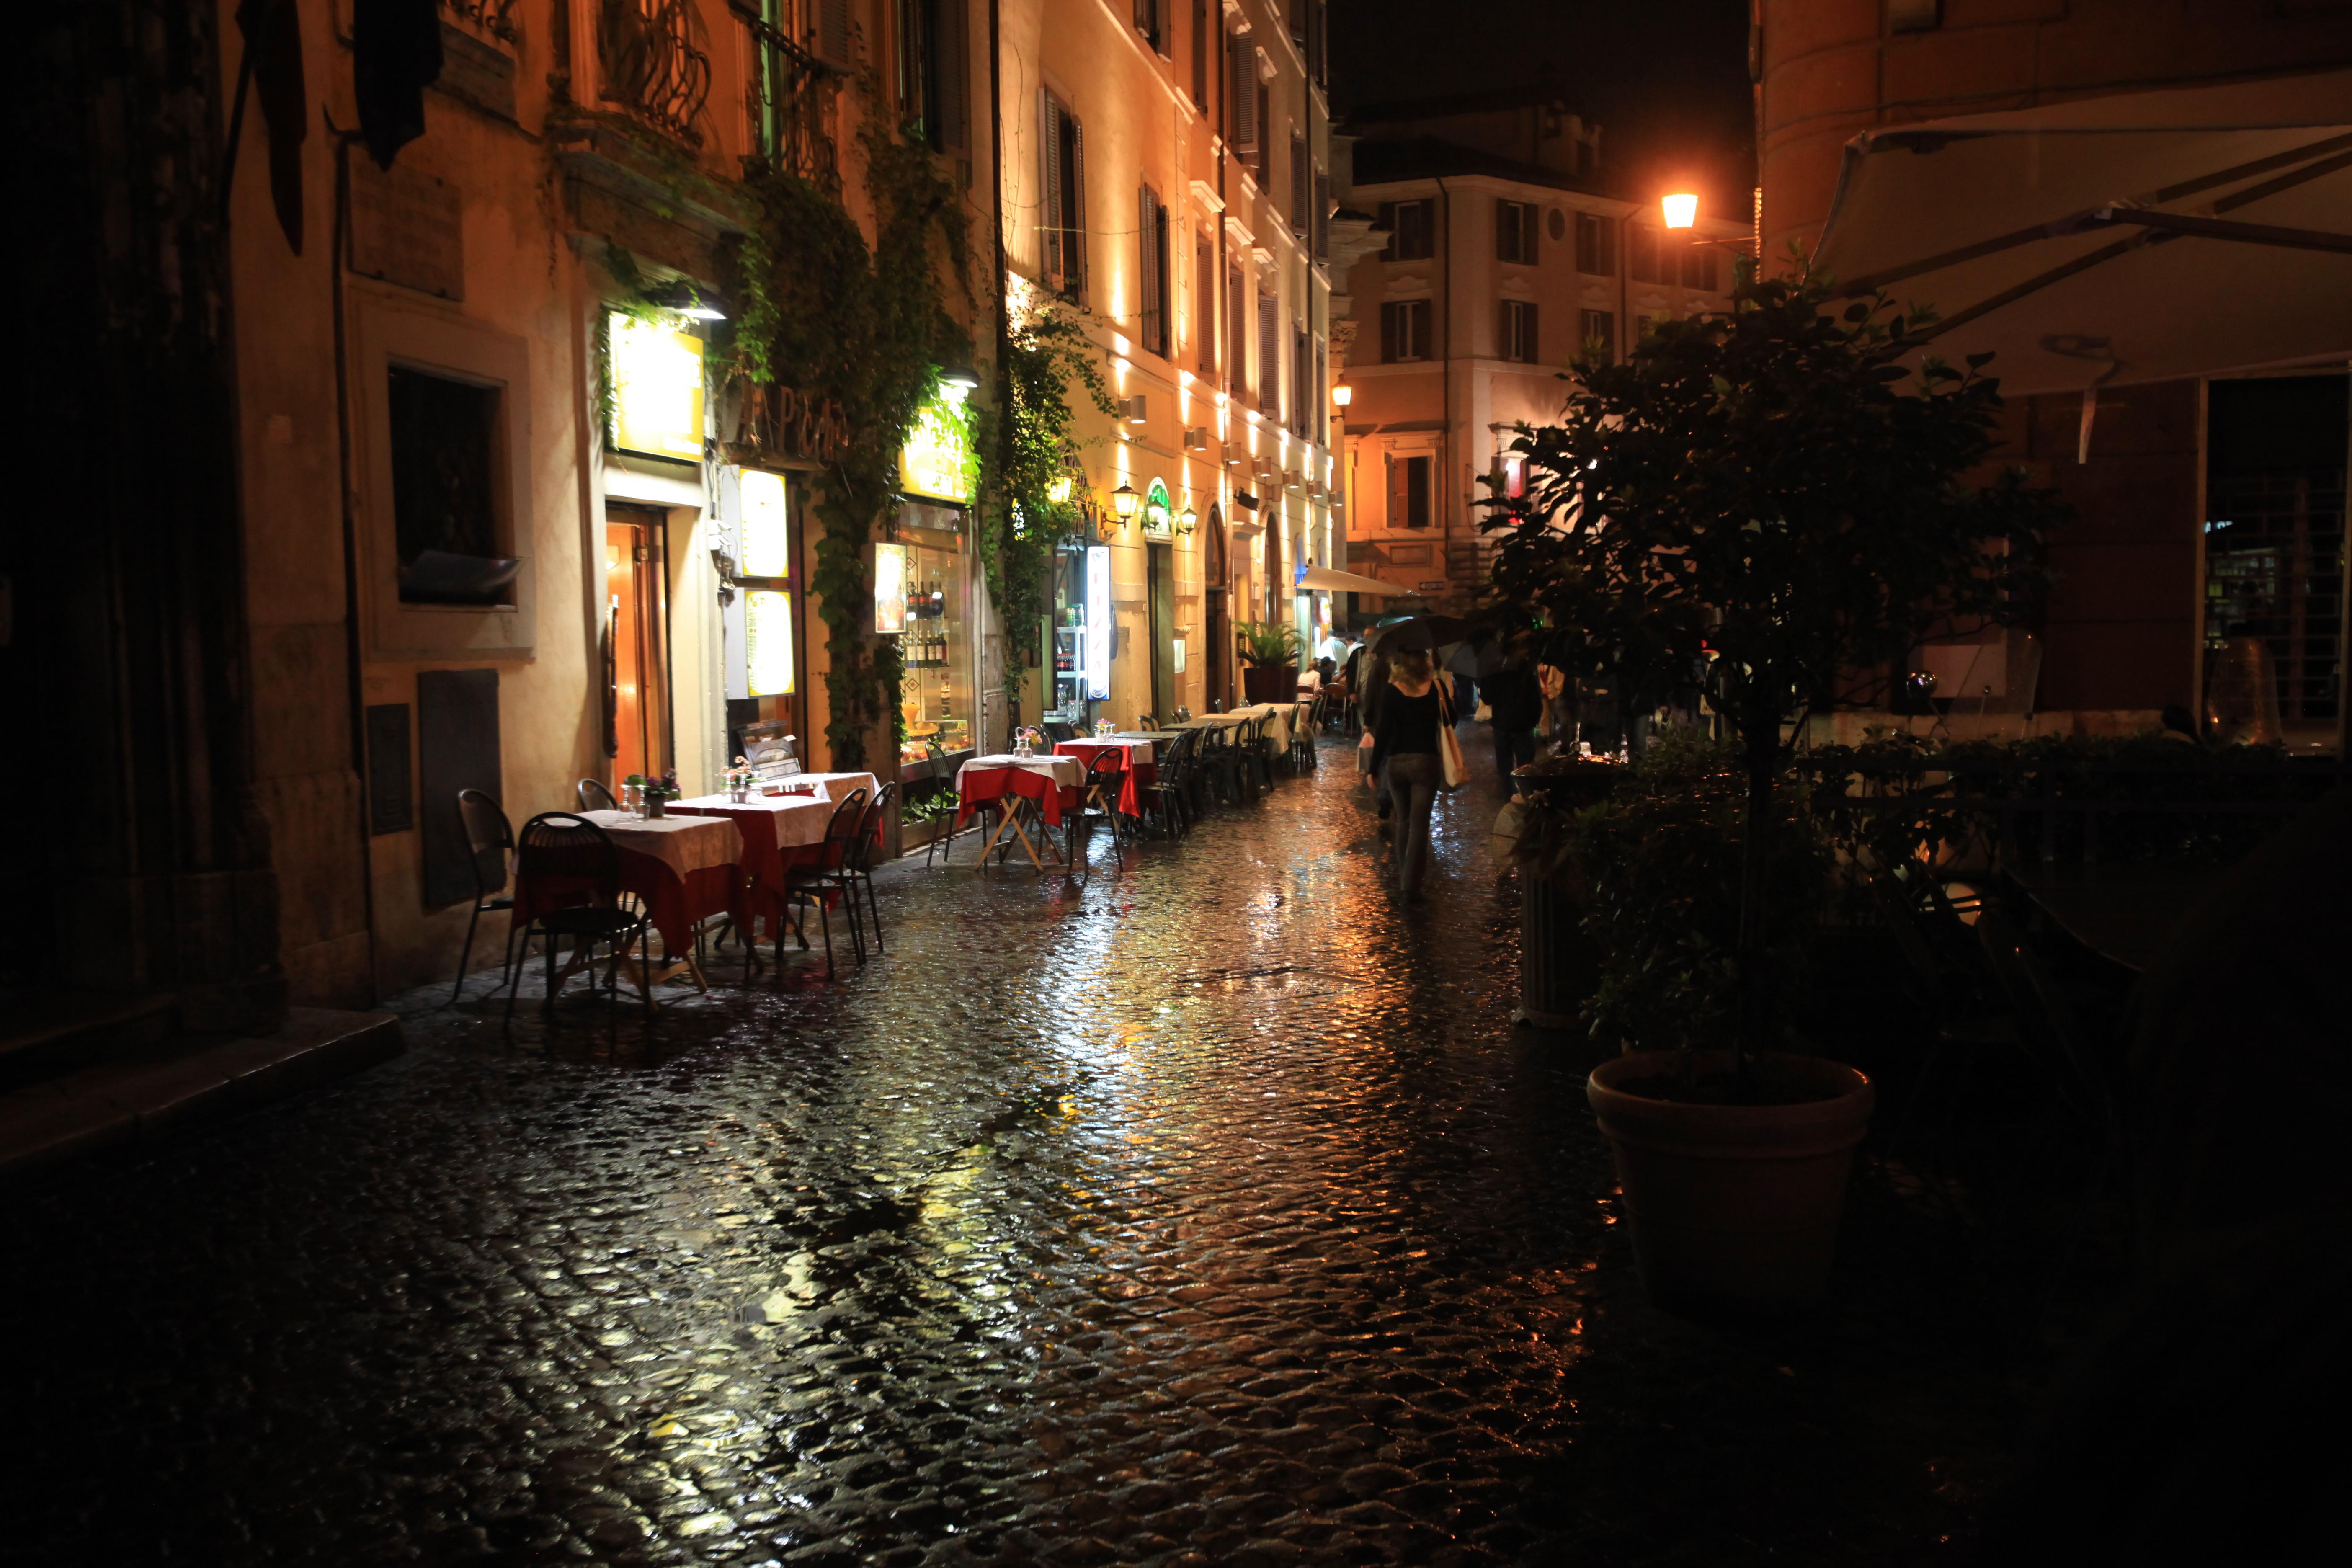 Italy Nicholas Dixon S Blog